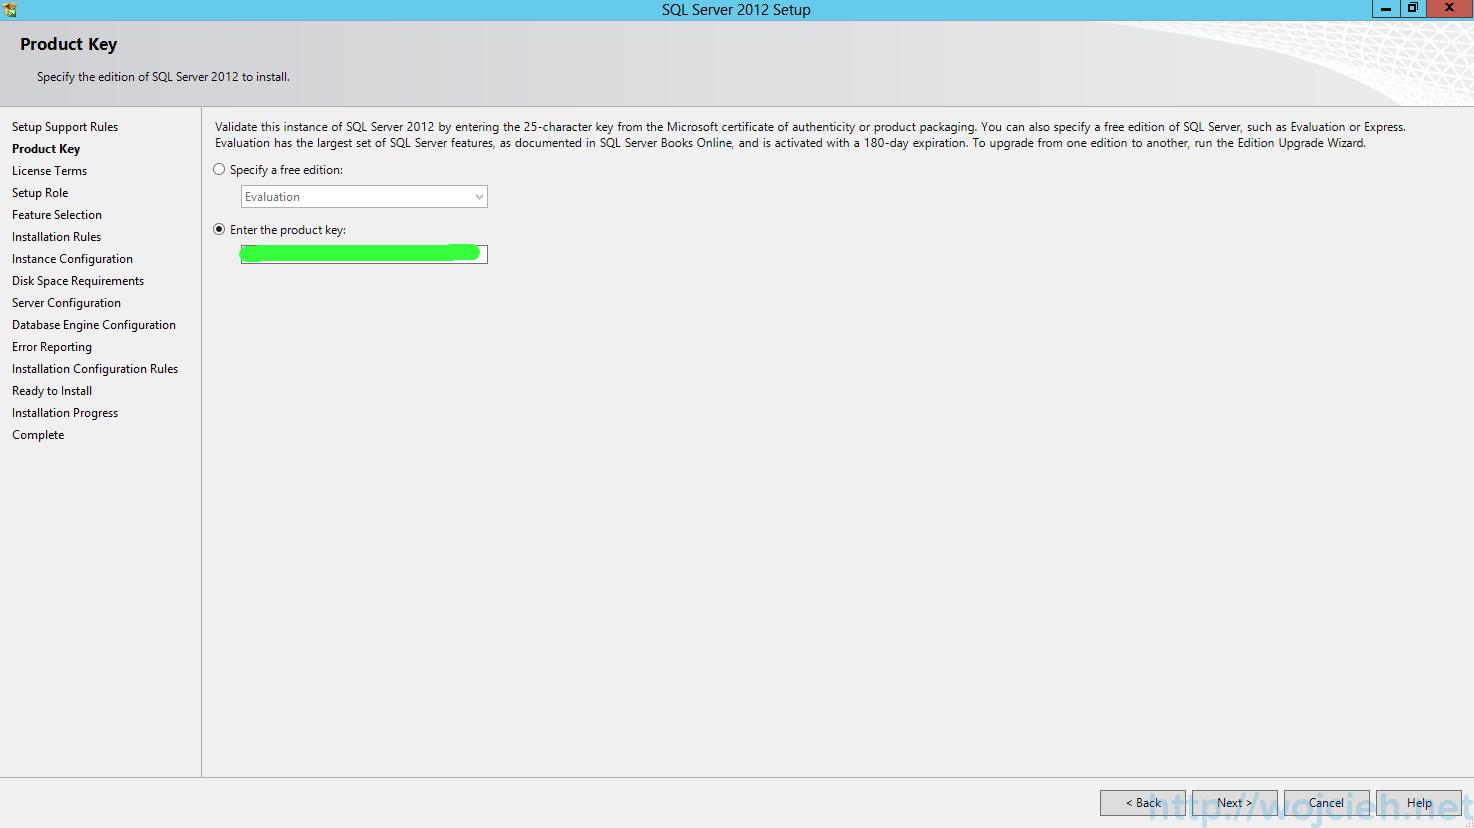 SQL Server 2012 SP1 - Product Key